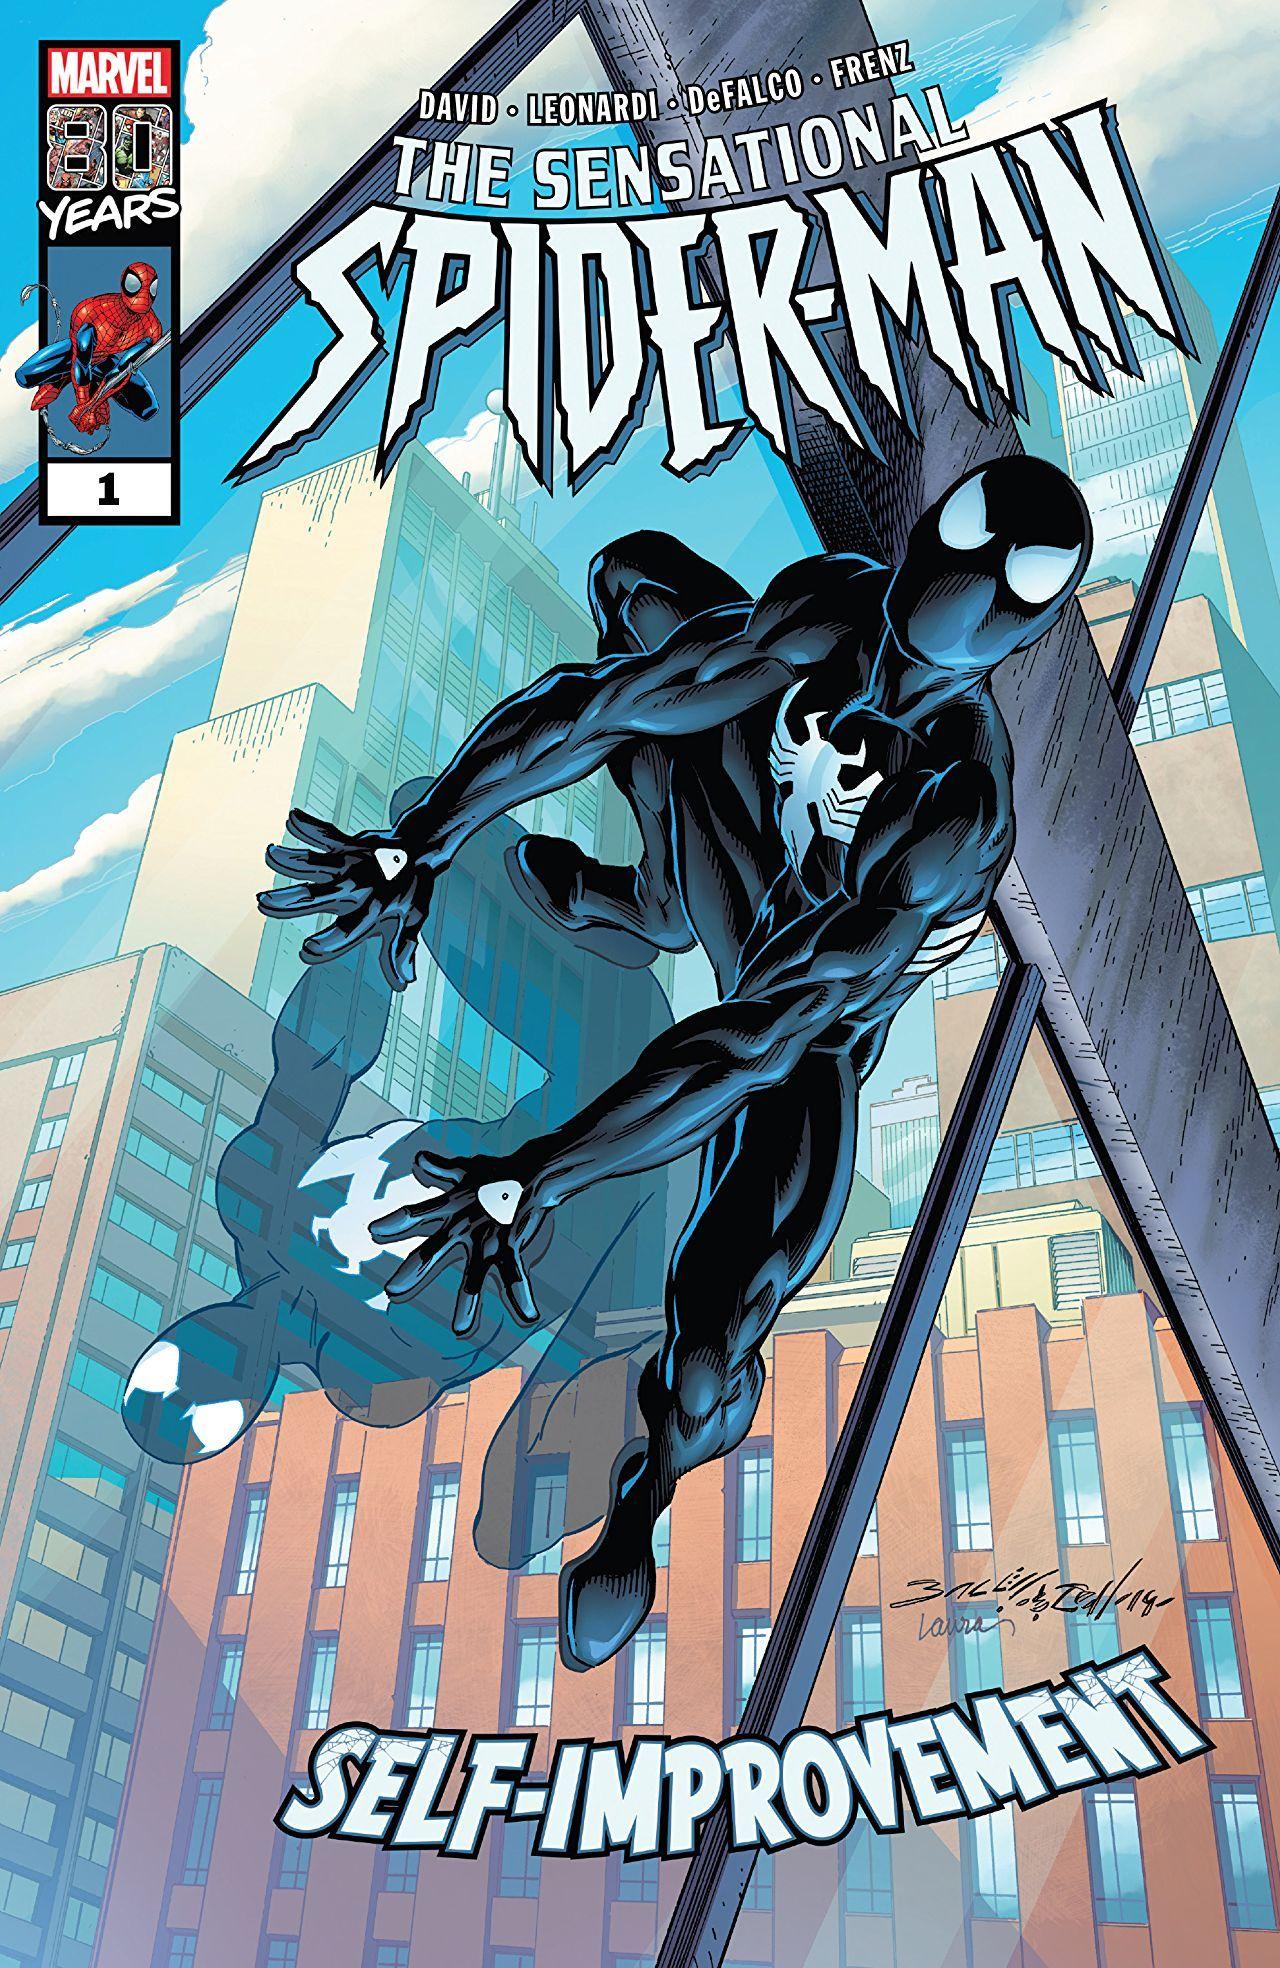 Sensational Spider-Man: Self-Improvement #1 Review | CBR